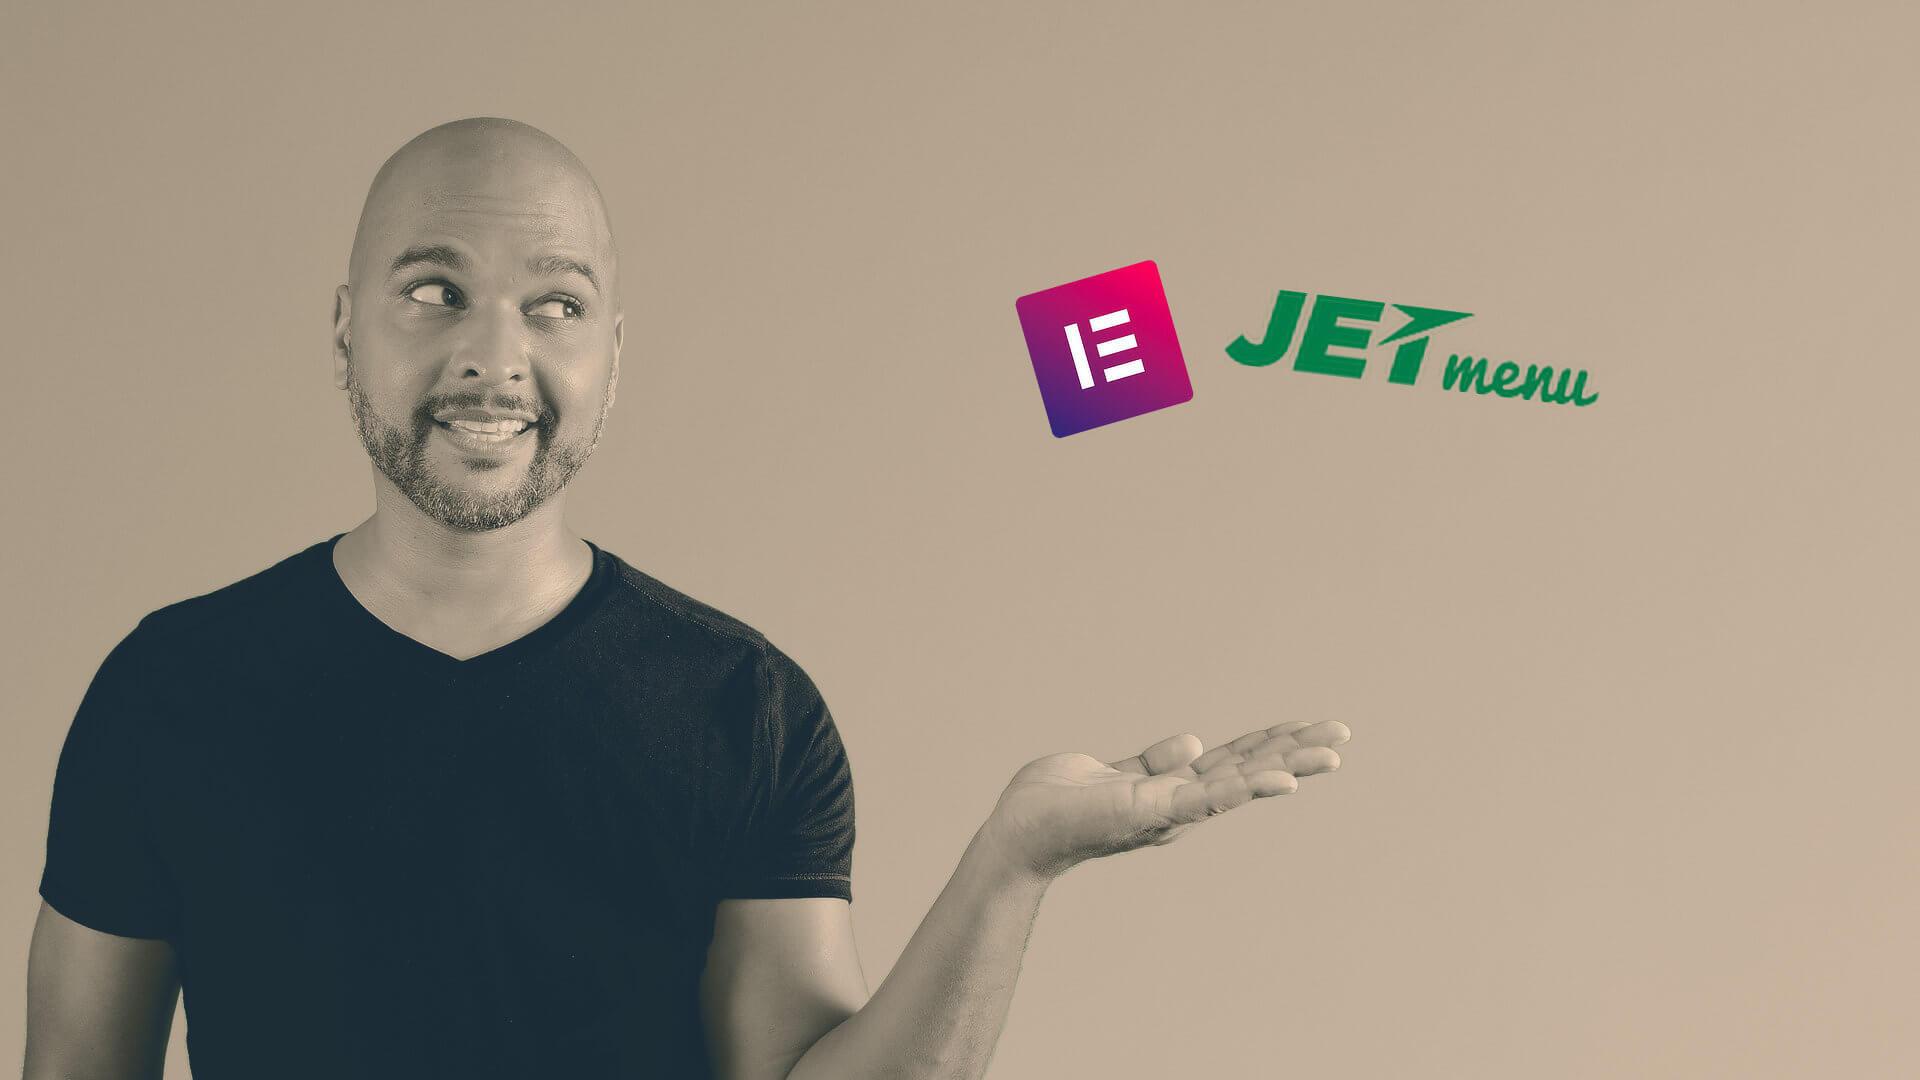 Wp Mega Menus With WordPress, Elementor Pro and JetMenu from Crocoblock